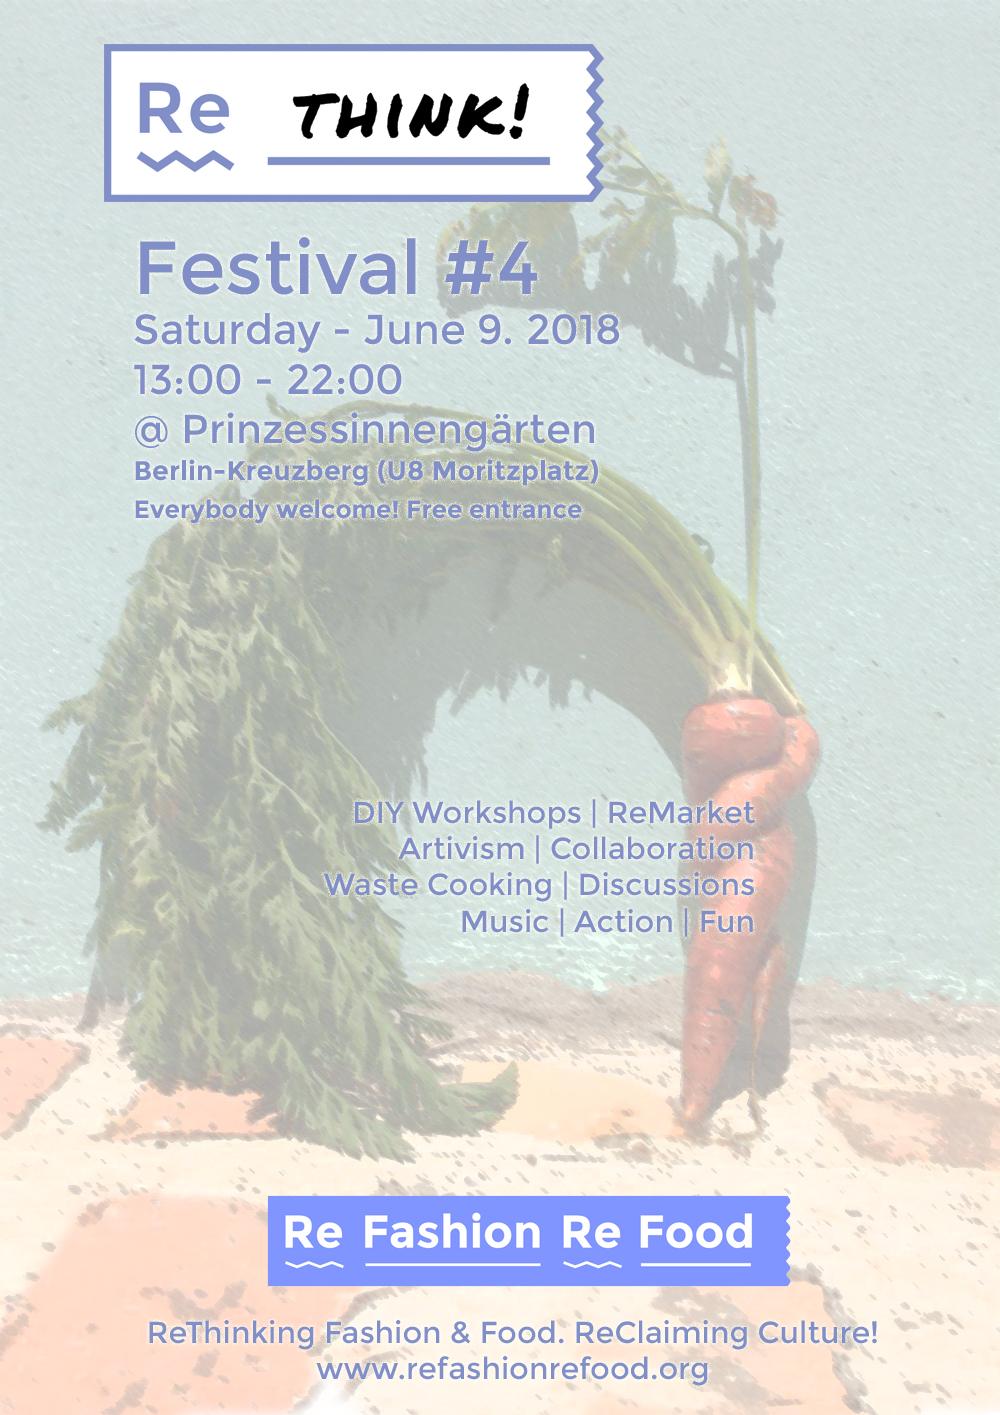 ReThink-Festival-#4-Berlin-Eng.jpg